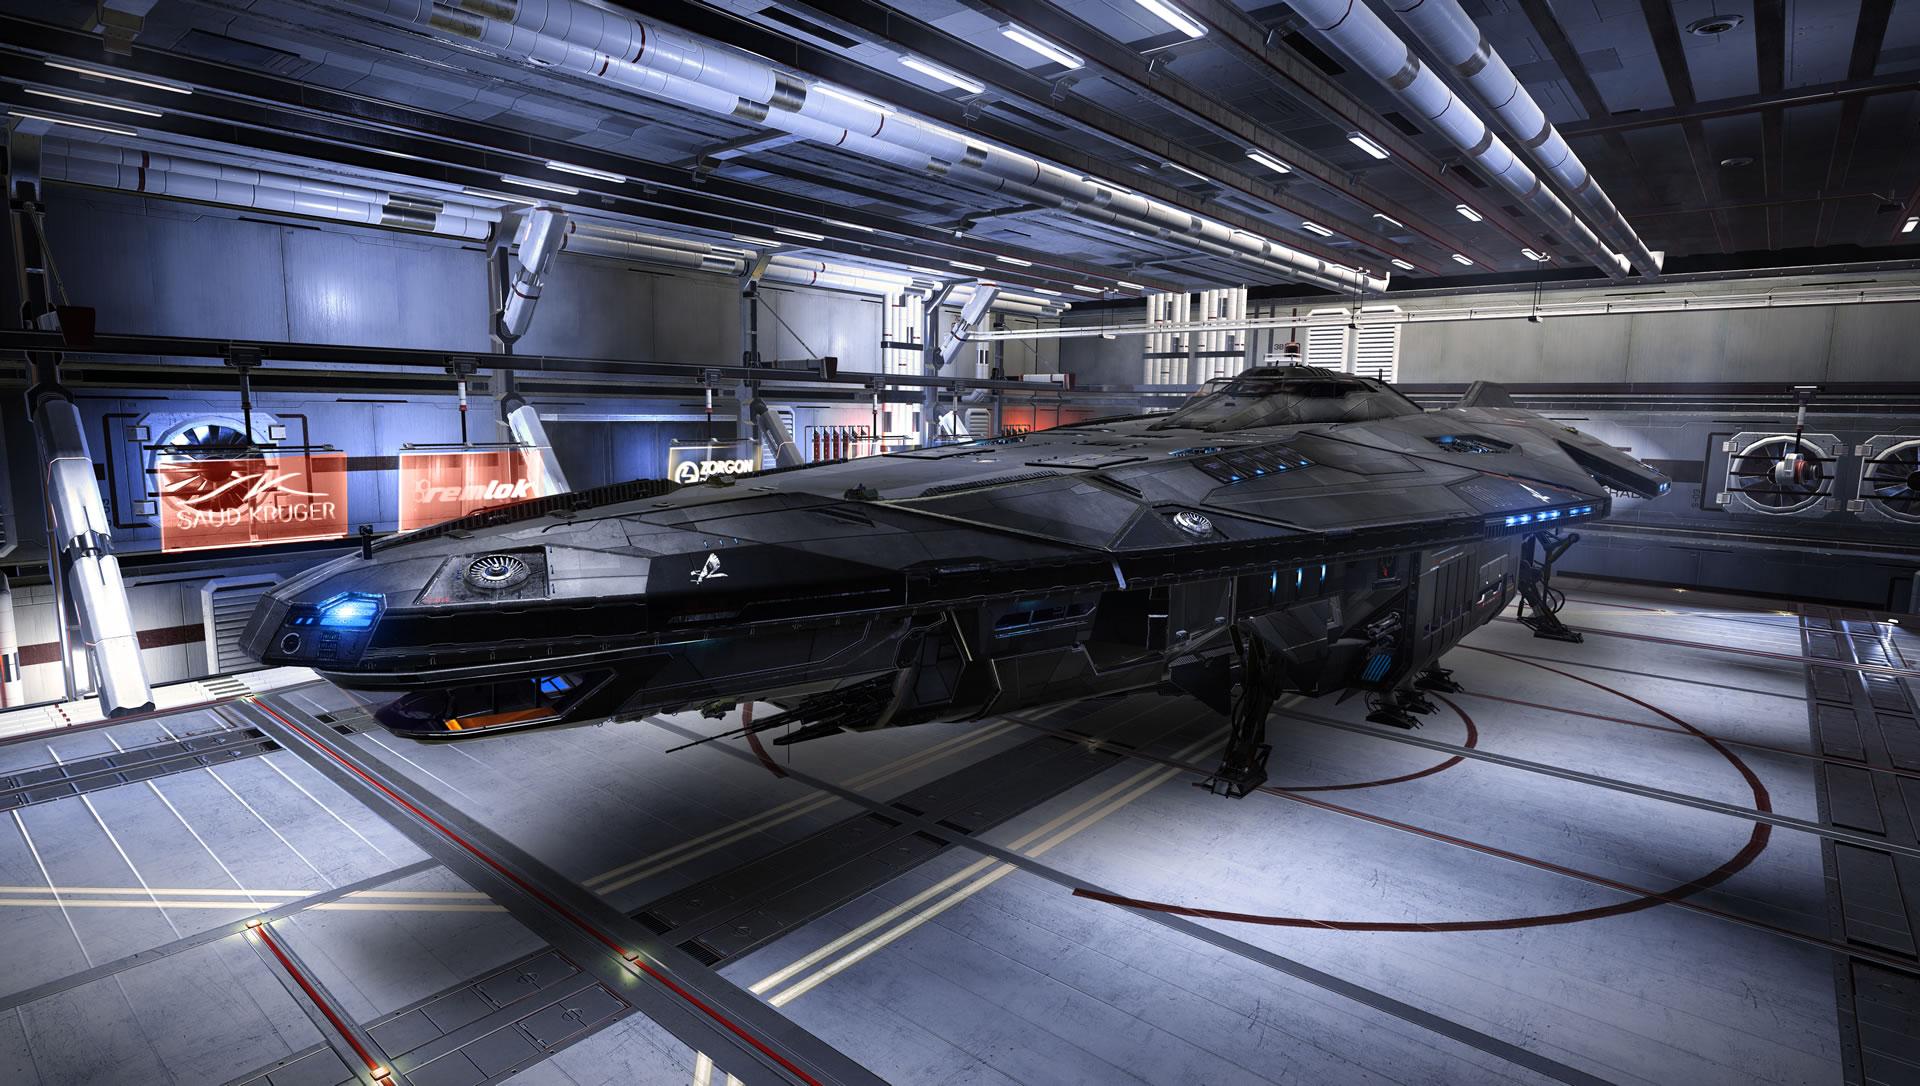 Elite Dangerous Shipyard Elite Dangerous